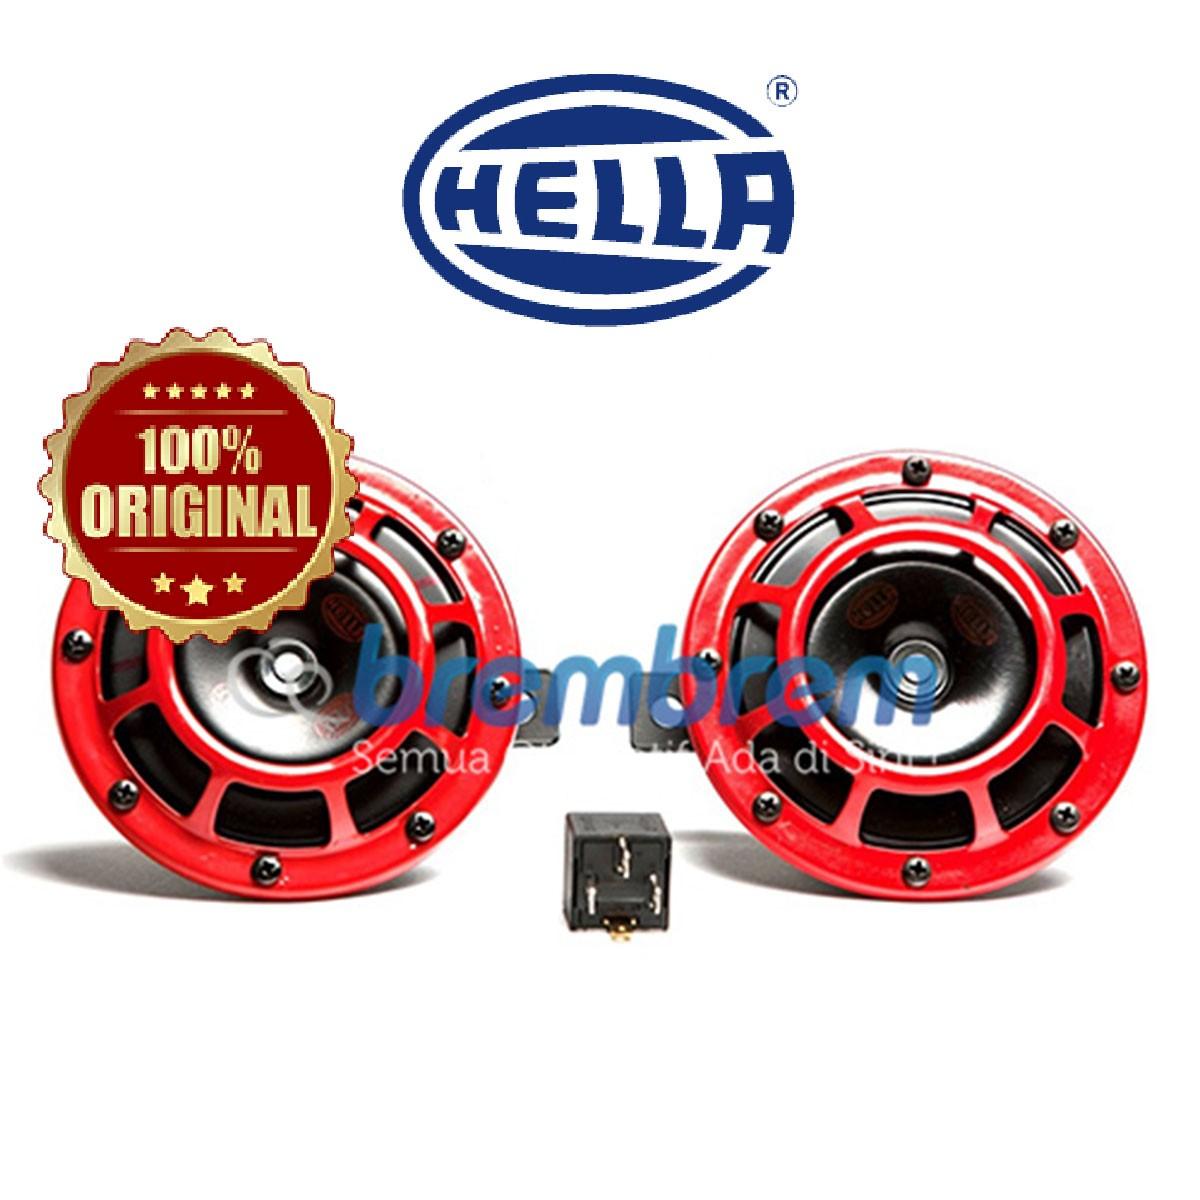 HELLA RED SUPER TONE - KLAKSON MOBIL